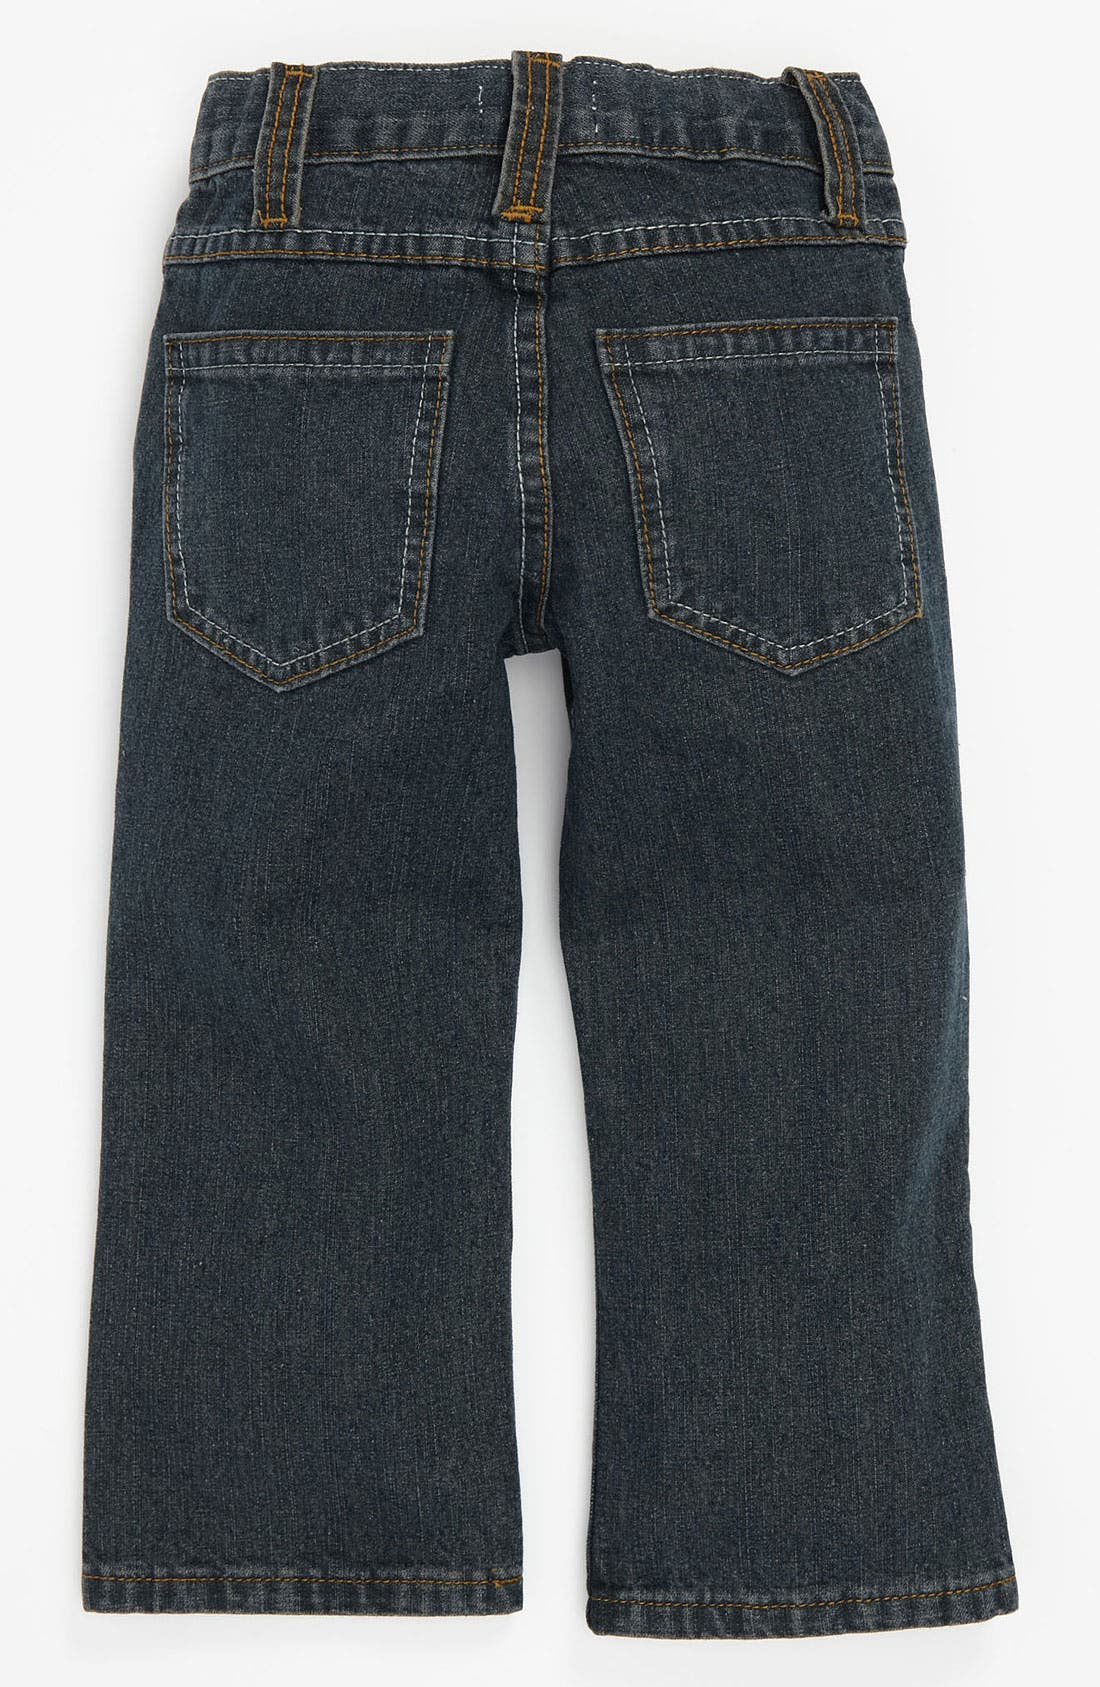 Main Image - Pumpkin Patch Regular Fit Jeans (Toddler)